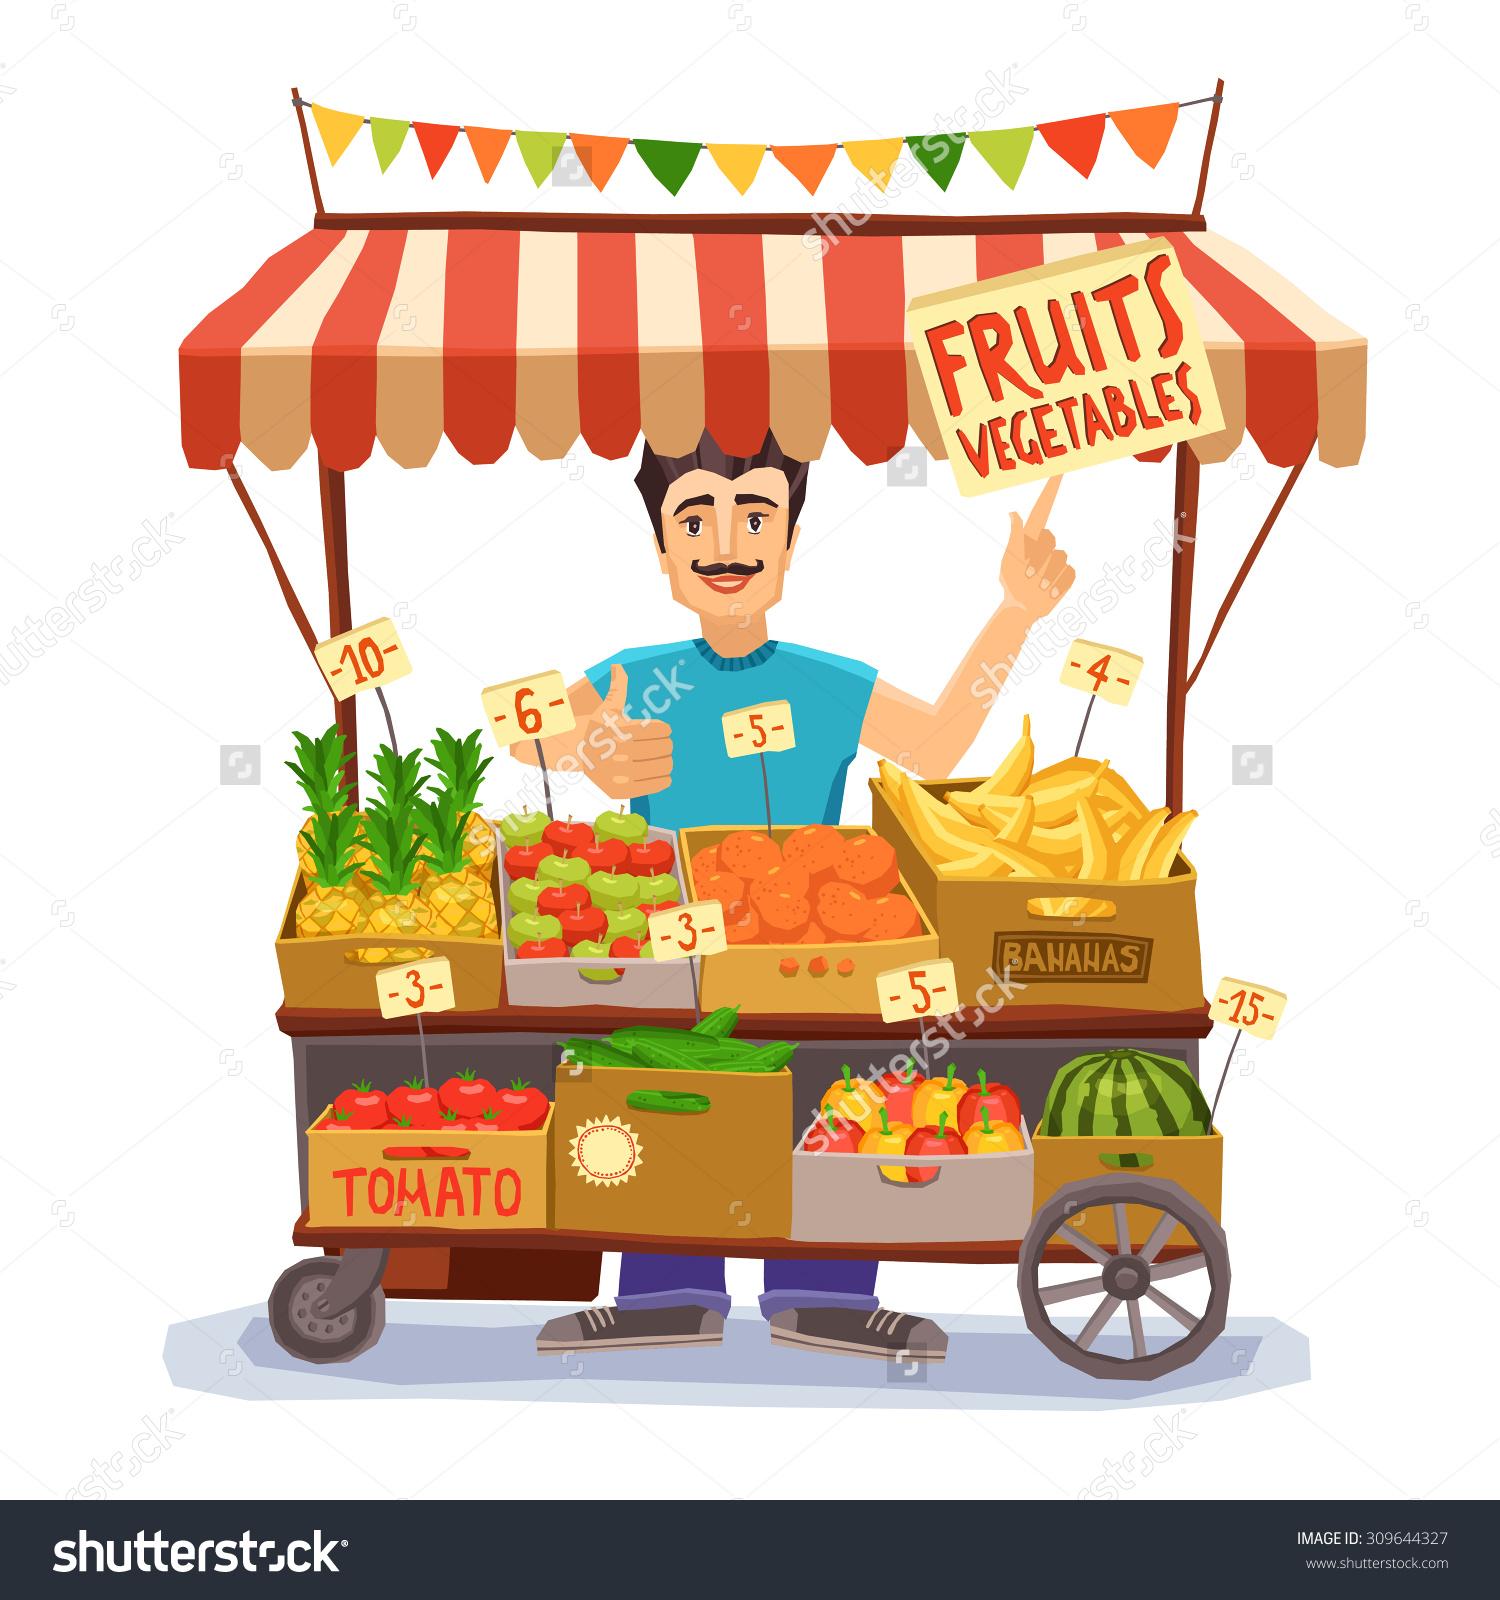 Vegetable Vendor Clipart.